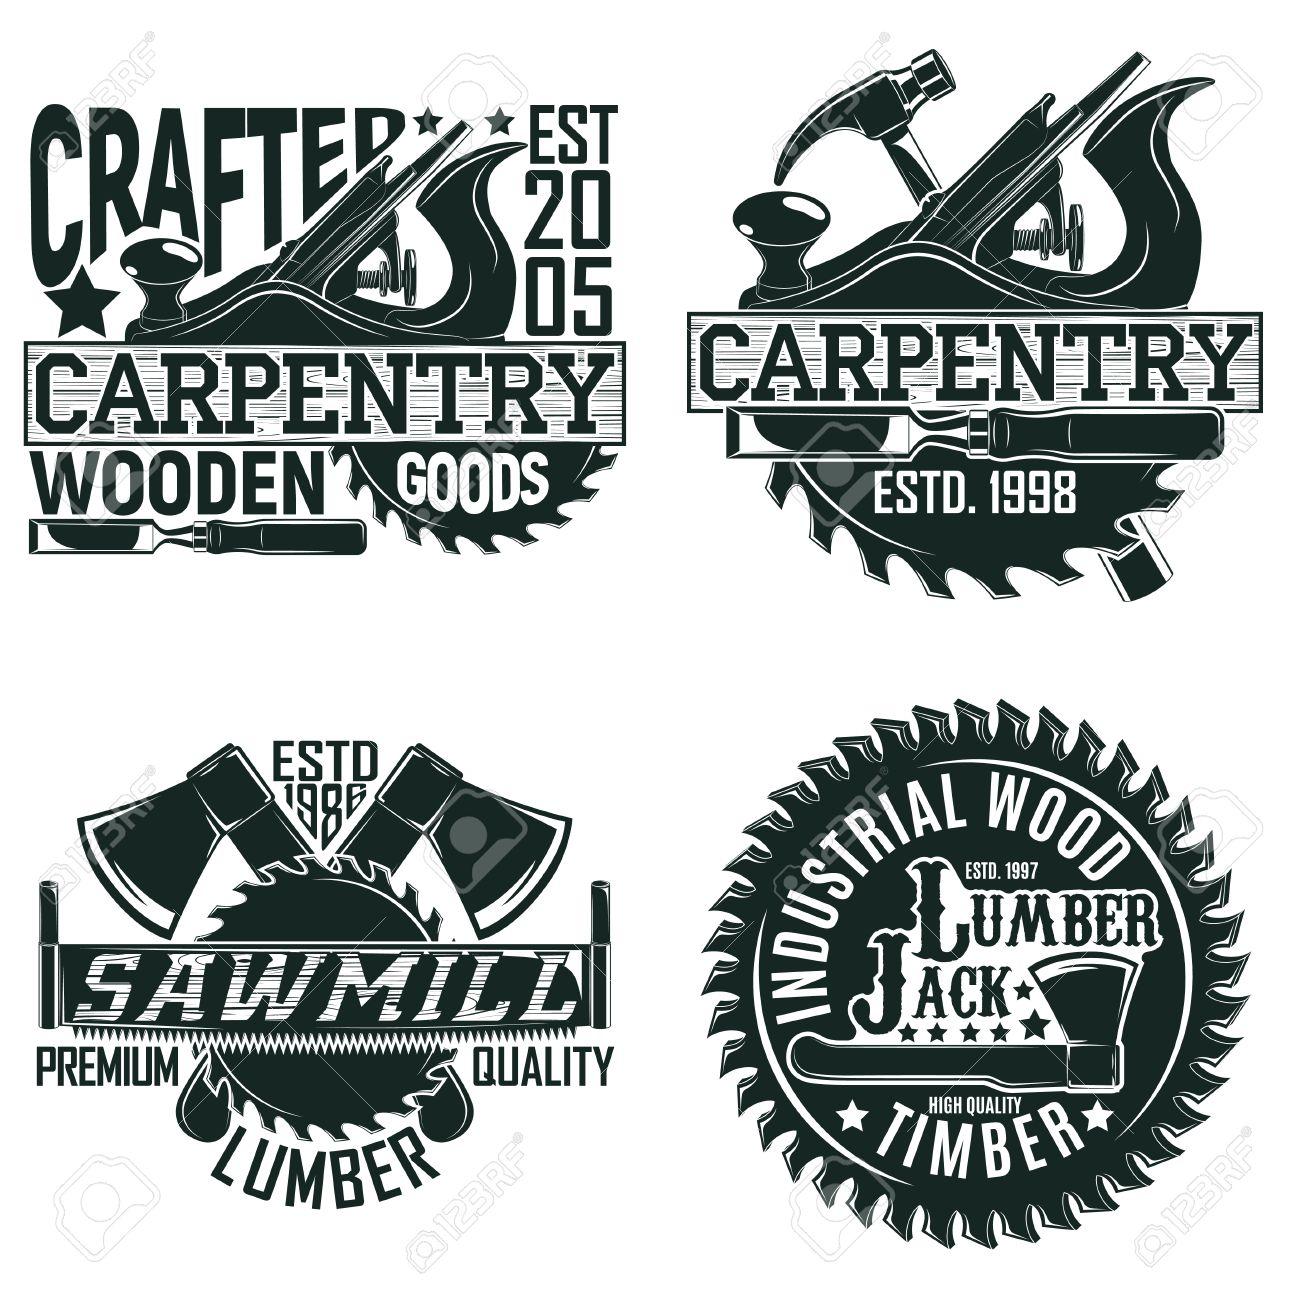 Set of Vintage woodworking logo designs, grange print stamps, creative carpentry typography emblems, Vector - 82676417